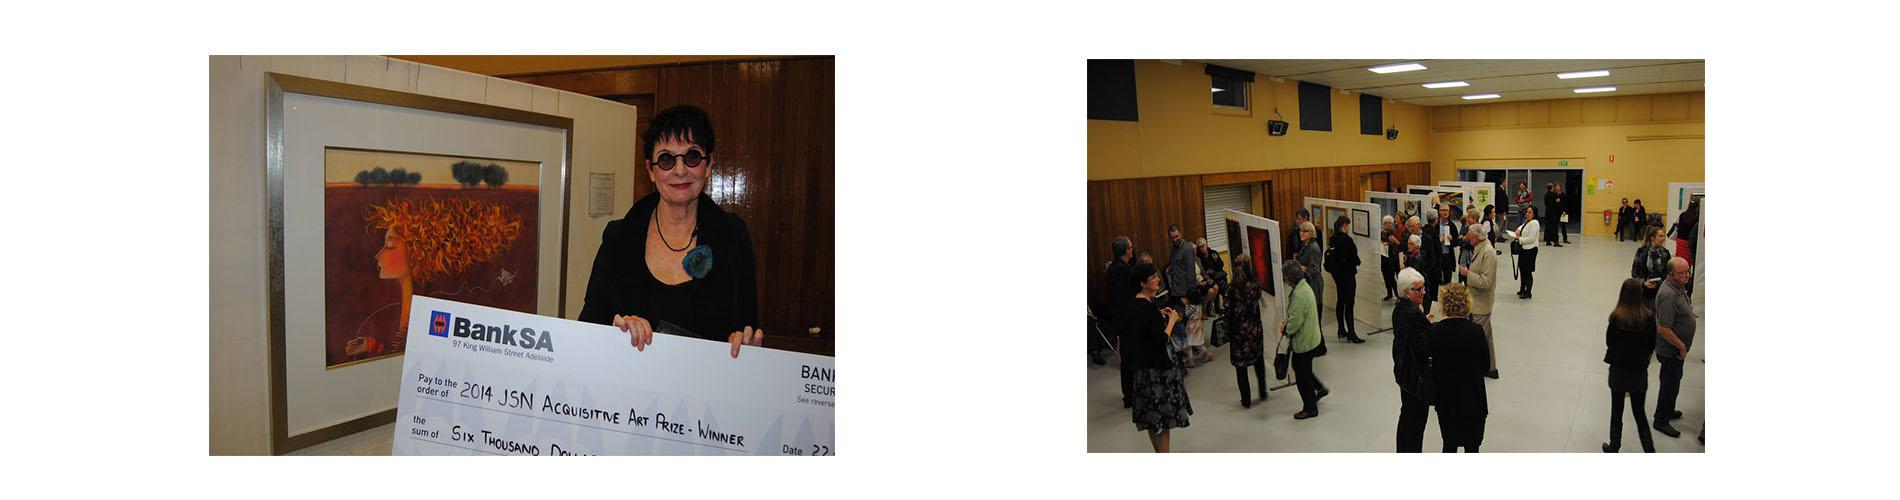 2014 John Shaw Neilson Acquisitive Art Prize Winner and Opening